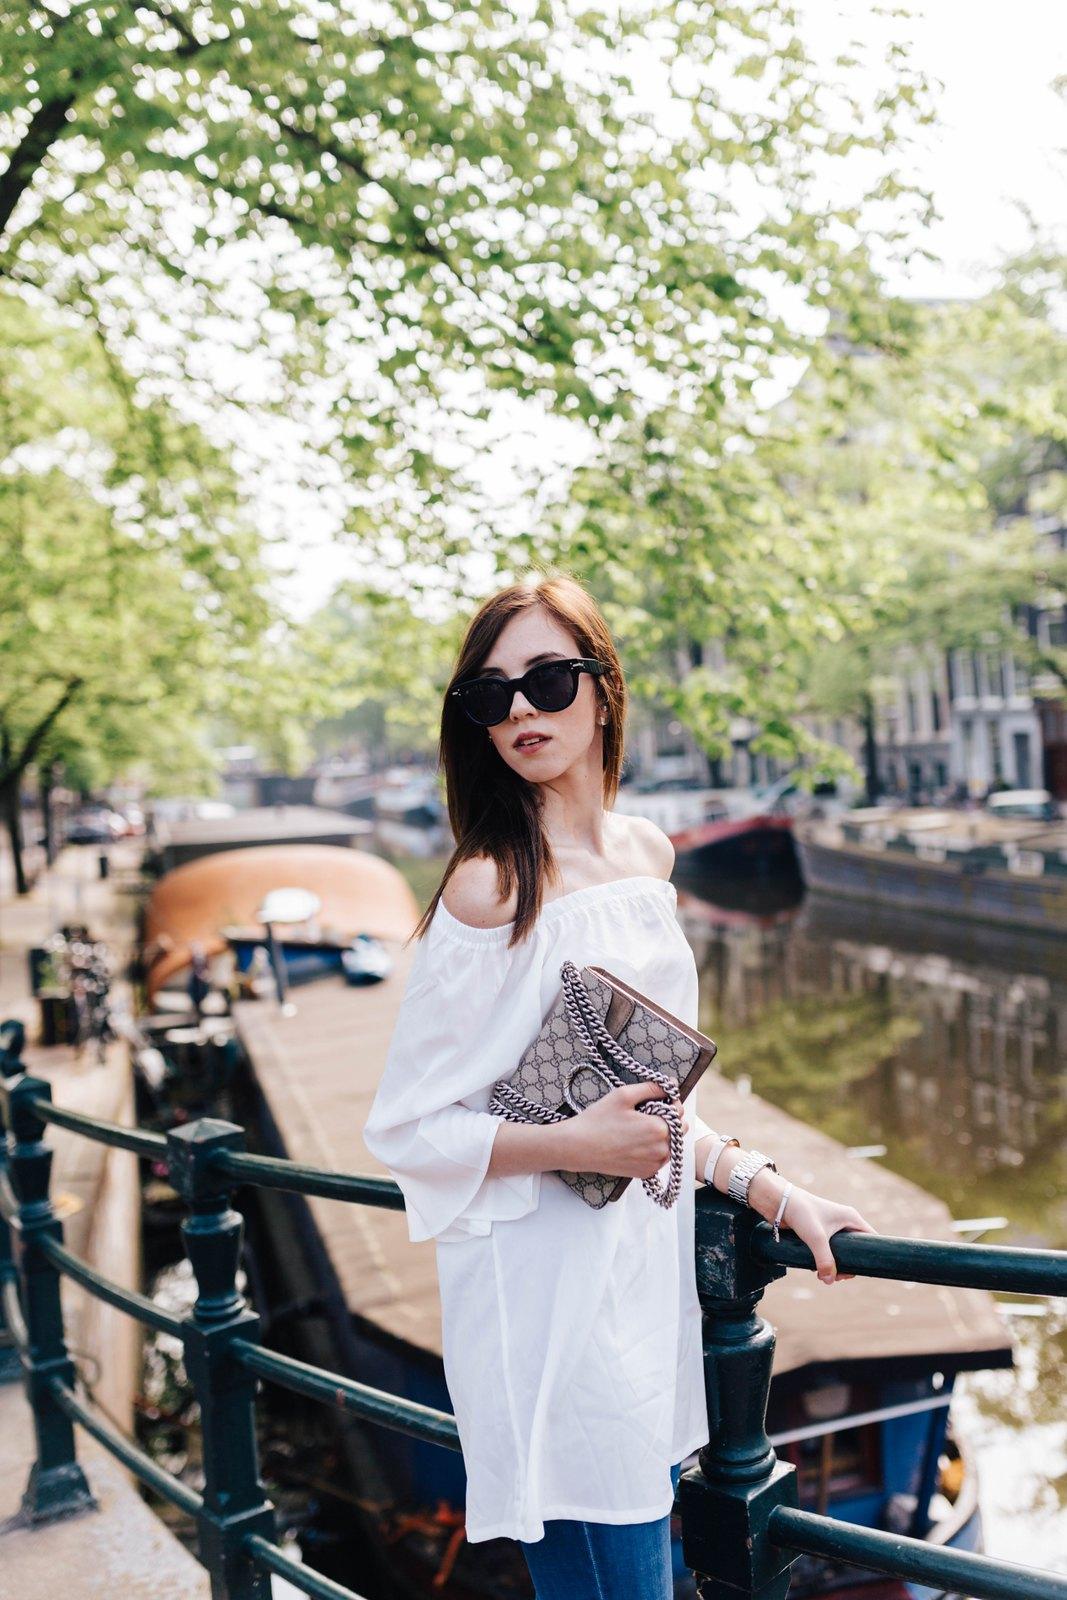 amsterdamphotowalk-111